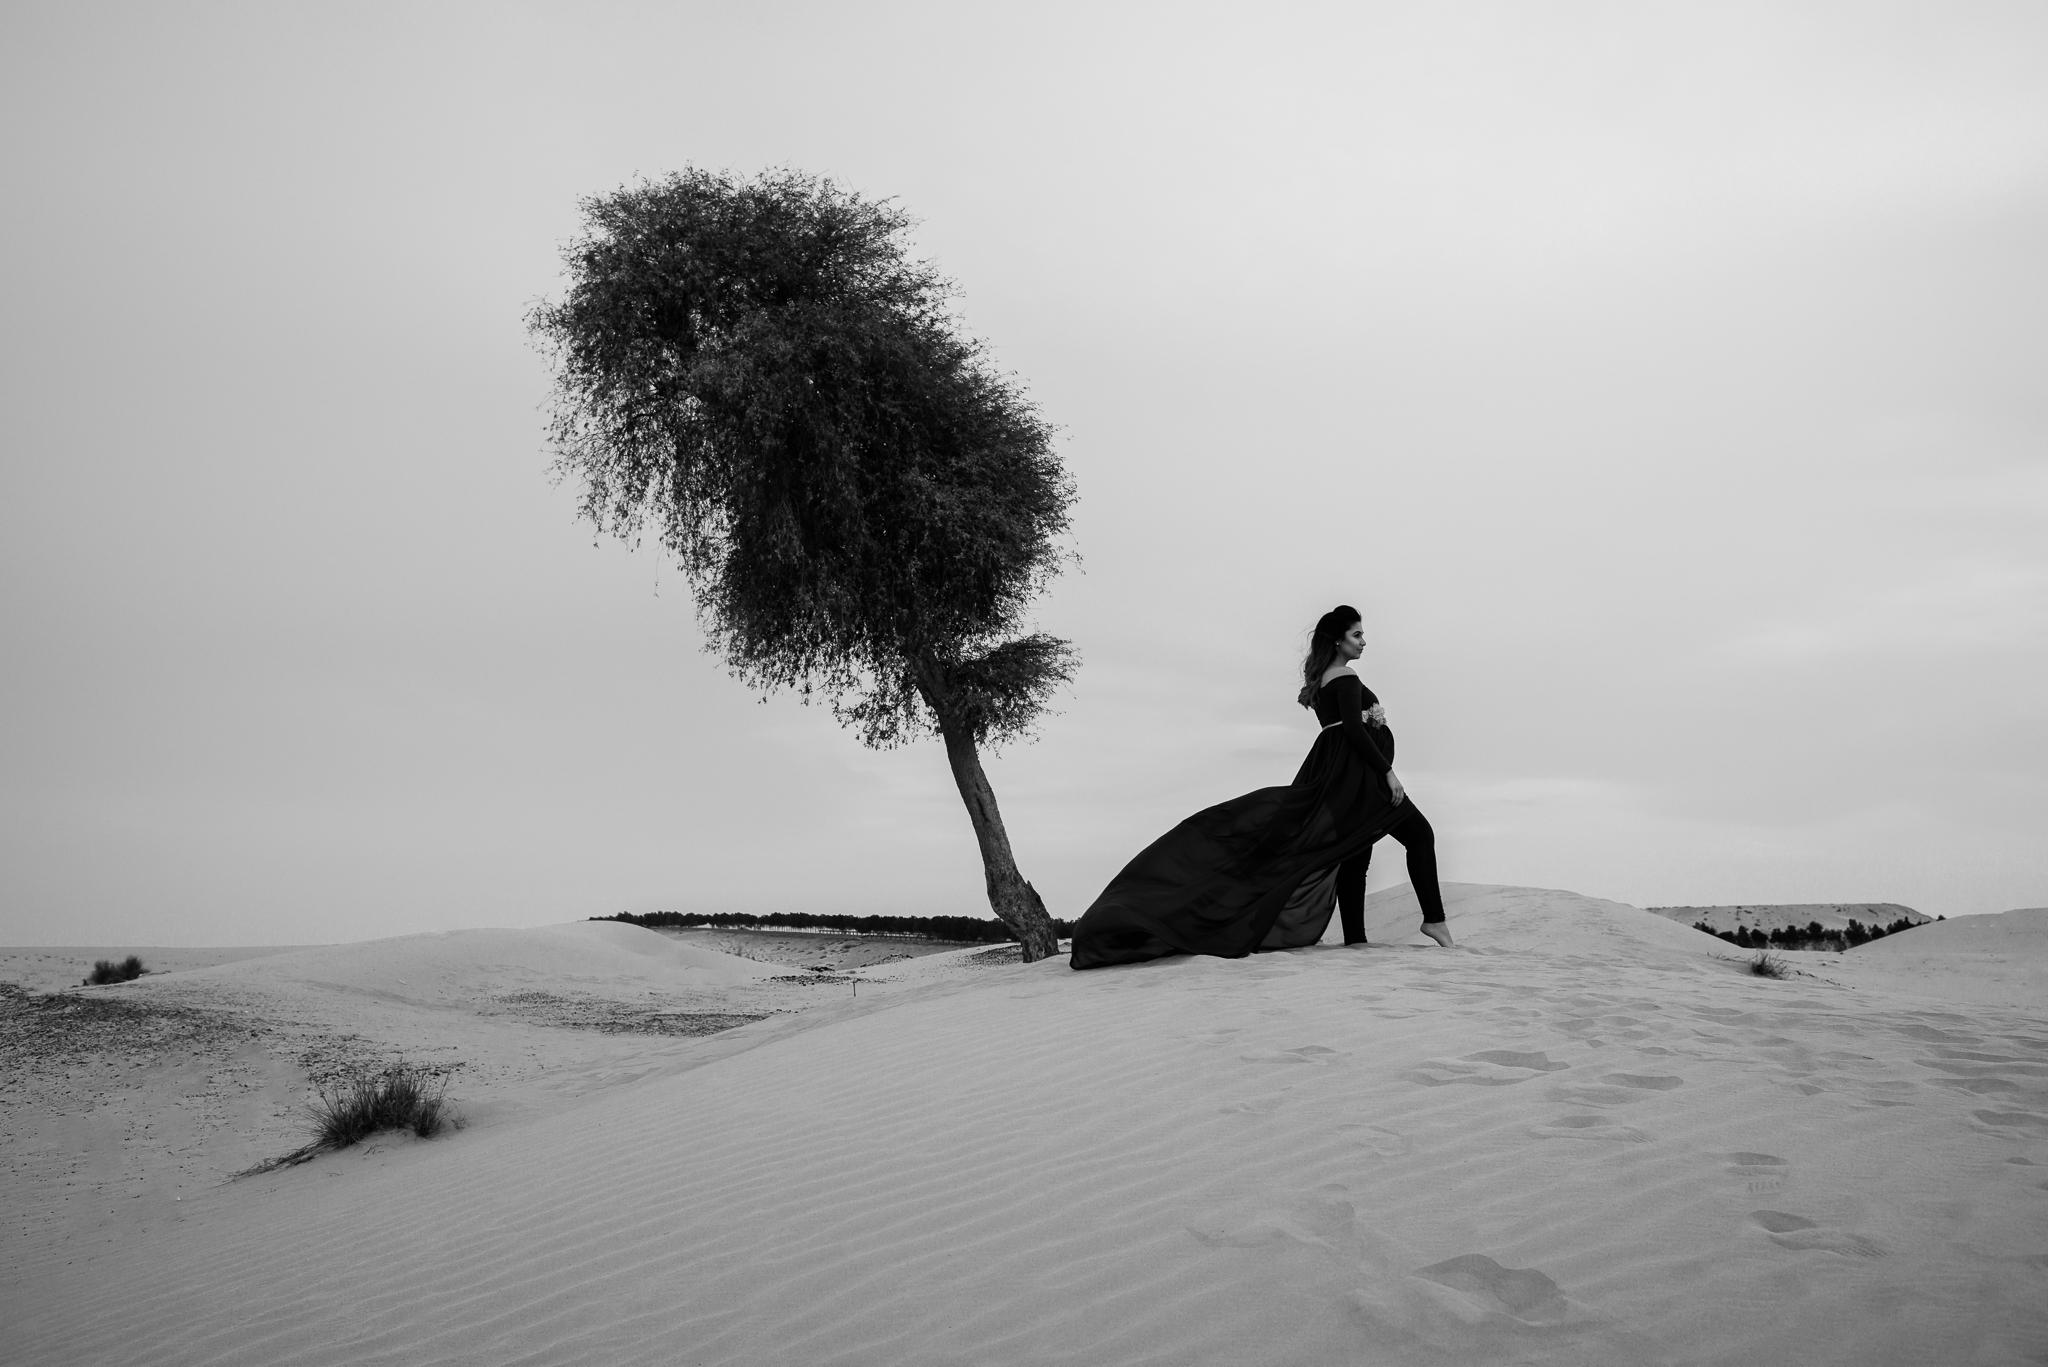 Lana-Photographs-Dubai-Maternity-Photographer-FatimaE-PSLR-55.jpg